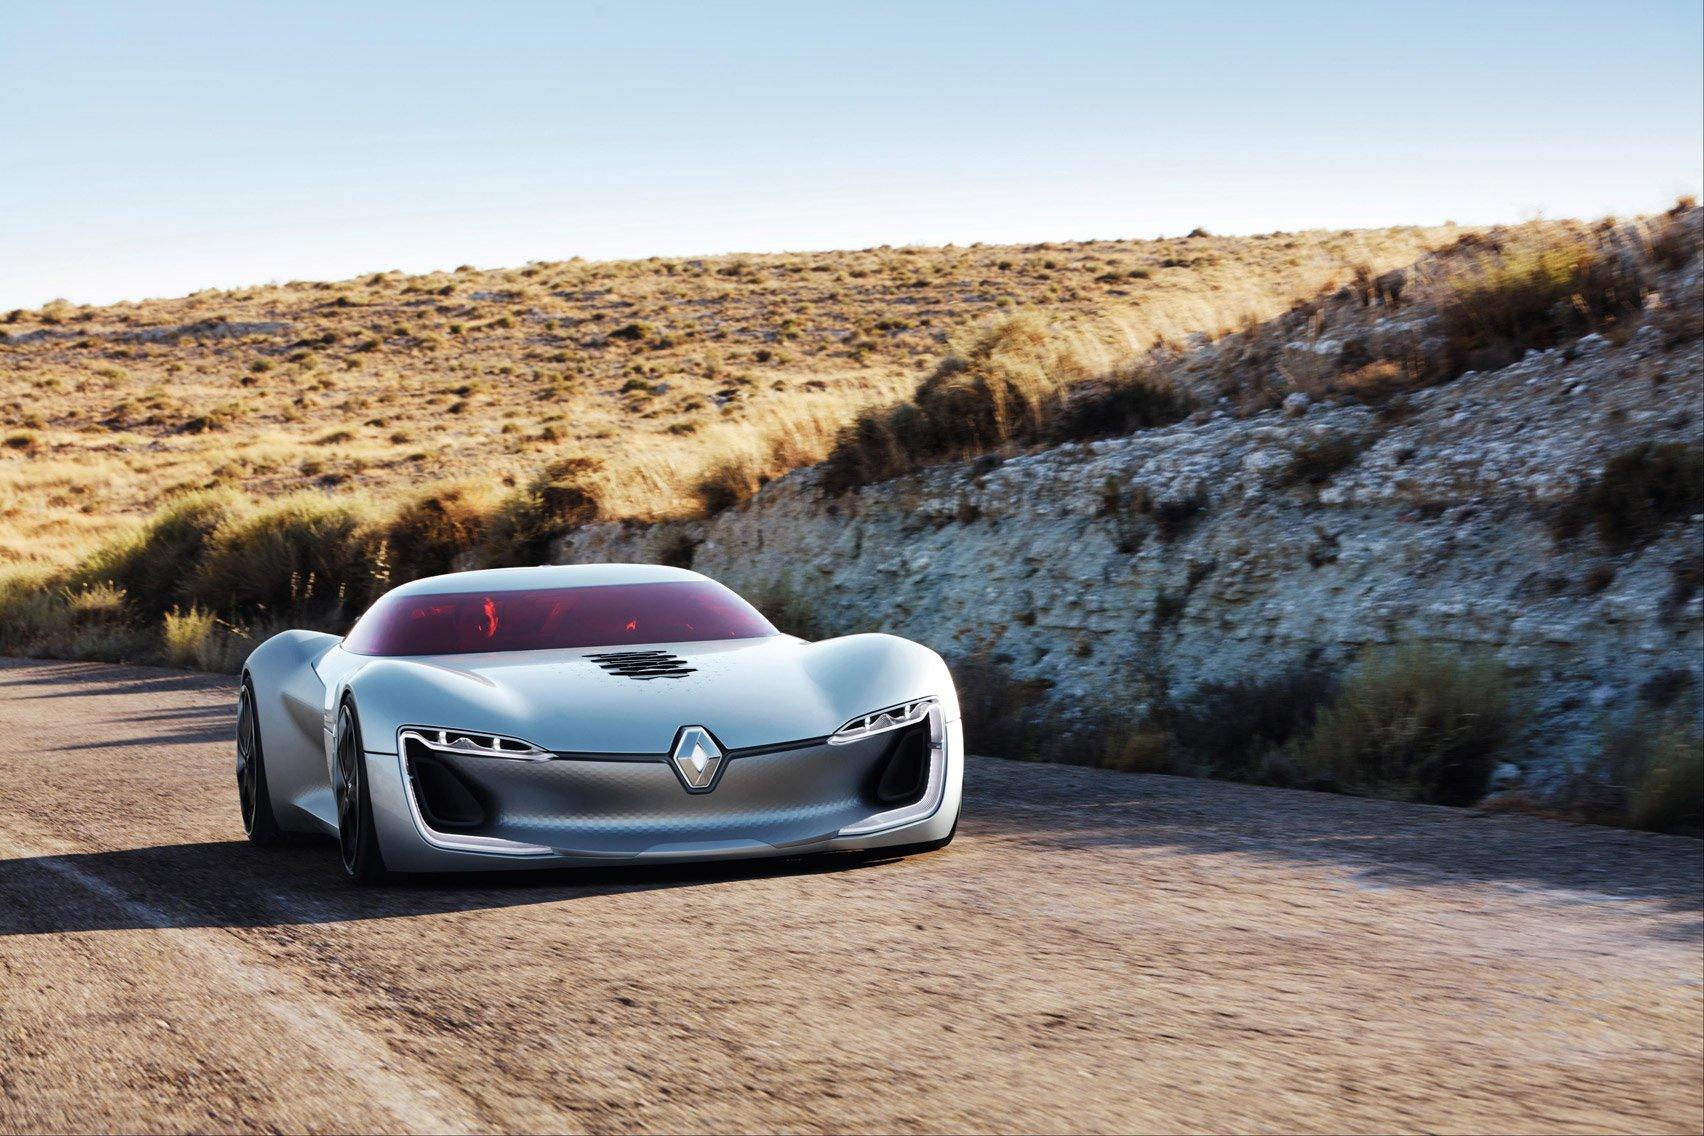 renault-trezor-concept-car-paris-motor-show_dezeen_1704_col_2